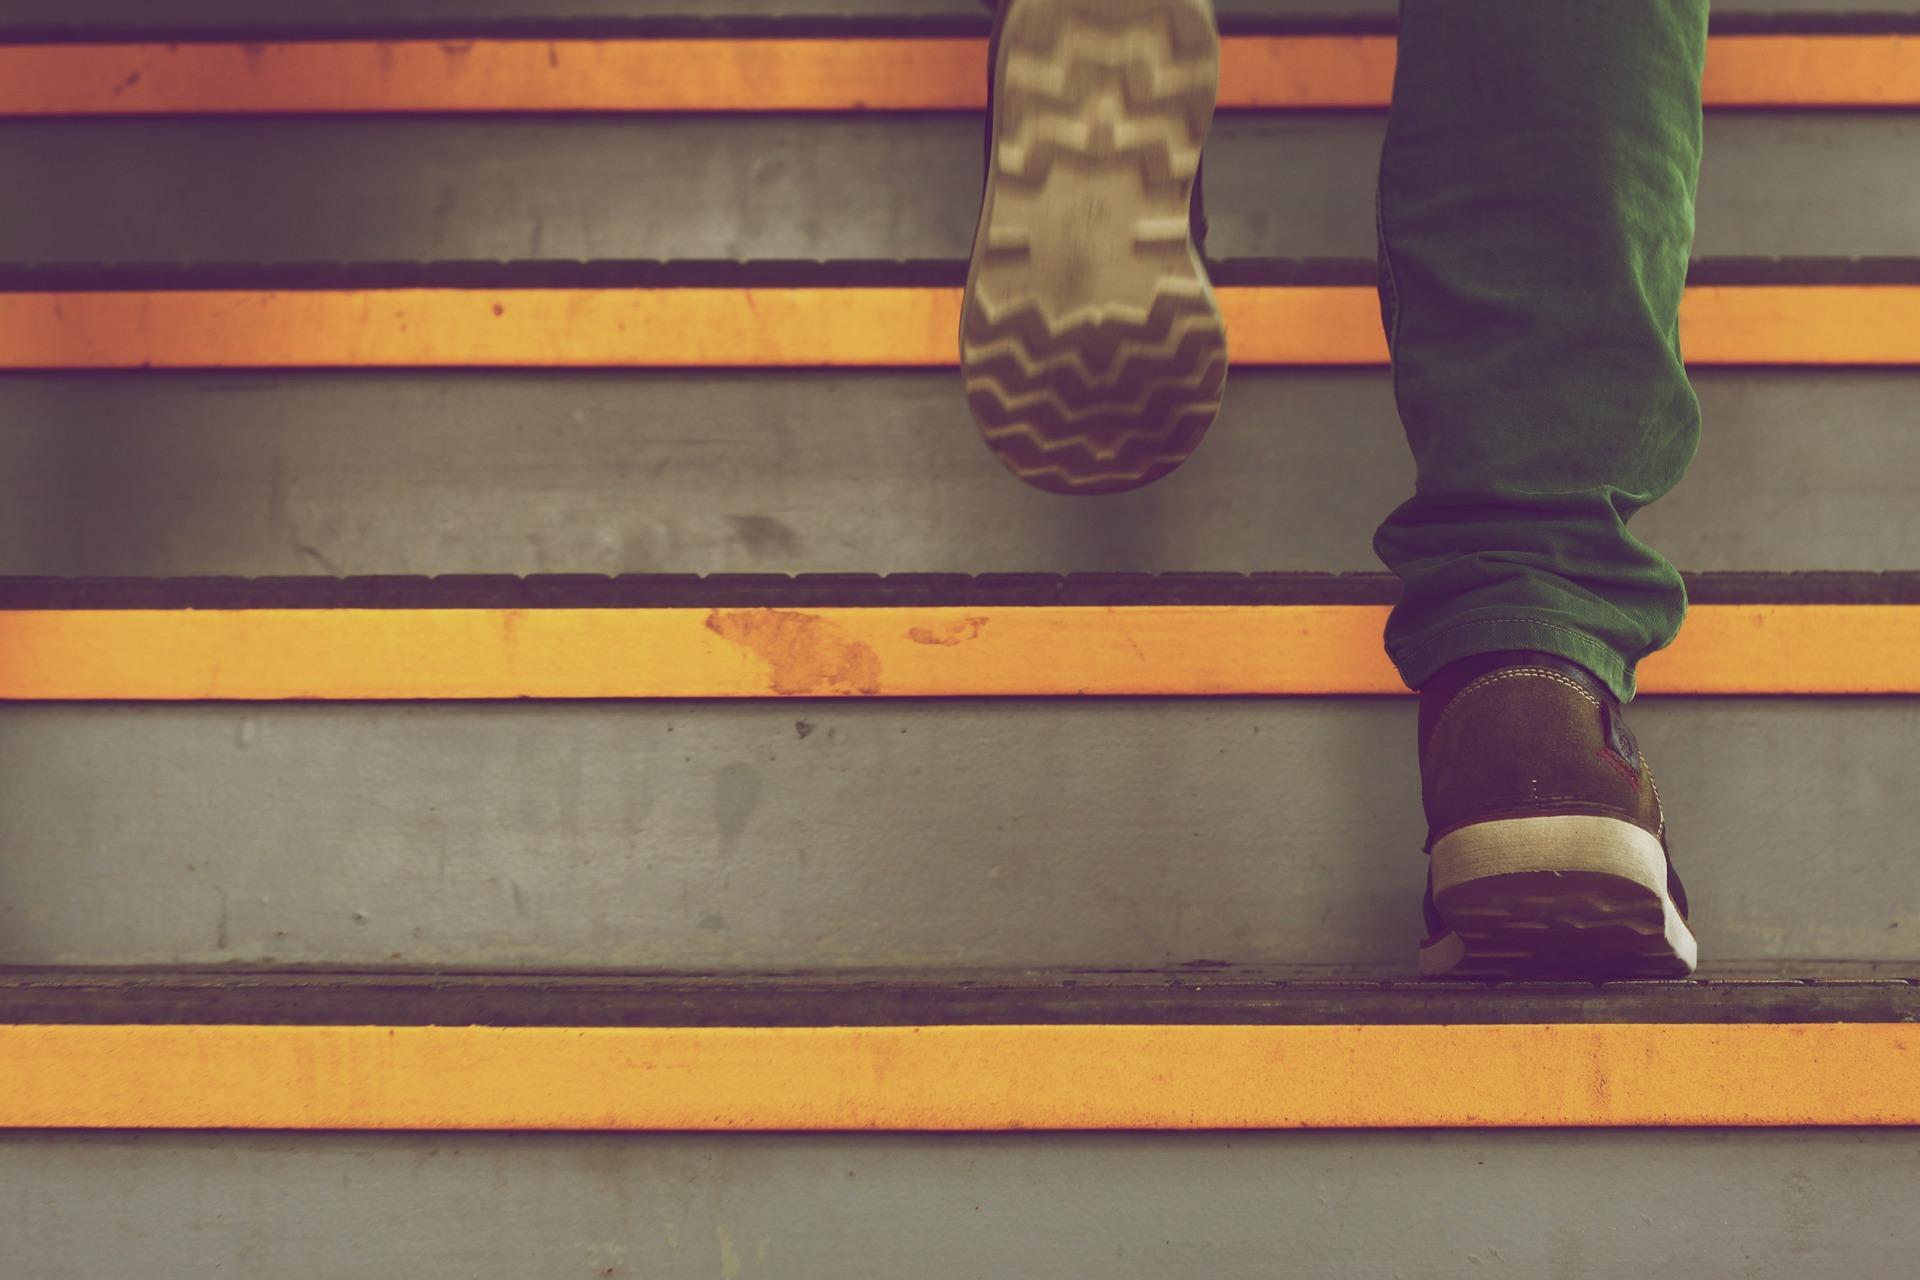 mission, goals, tasks, milestones, steps